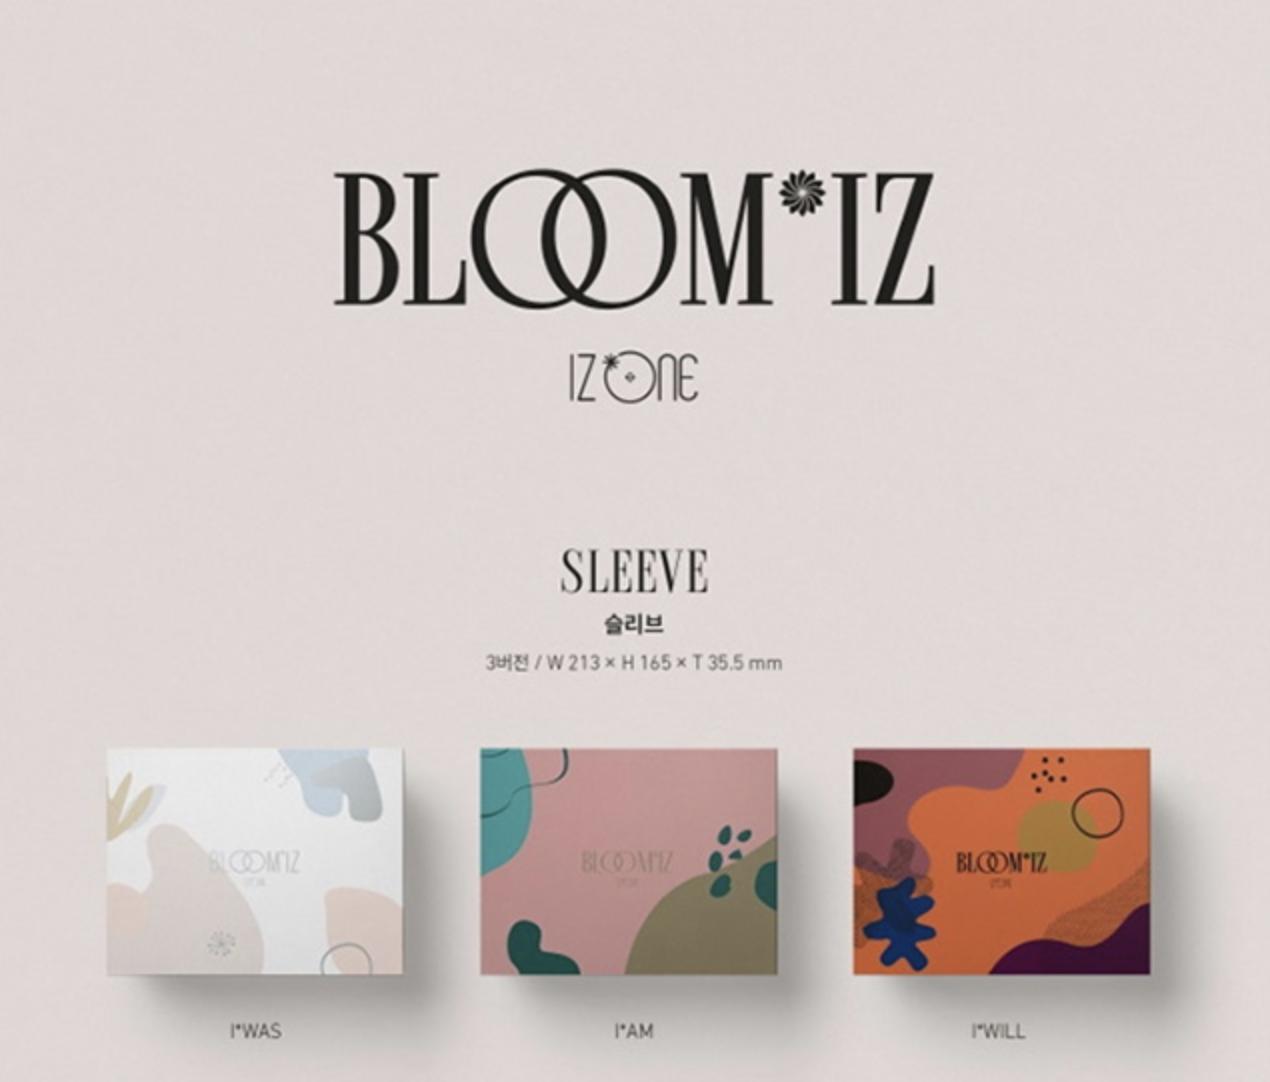 IZ*ONE ファーストアルバム「BLOOM*IZ」(輸入盤)の予約販売決定!最安値ページや特典内容をご紹介!